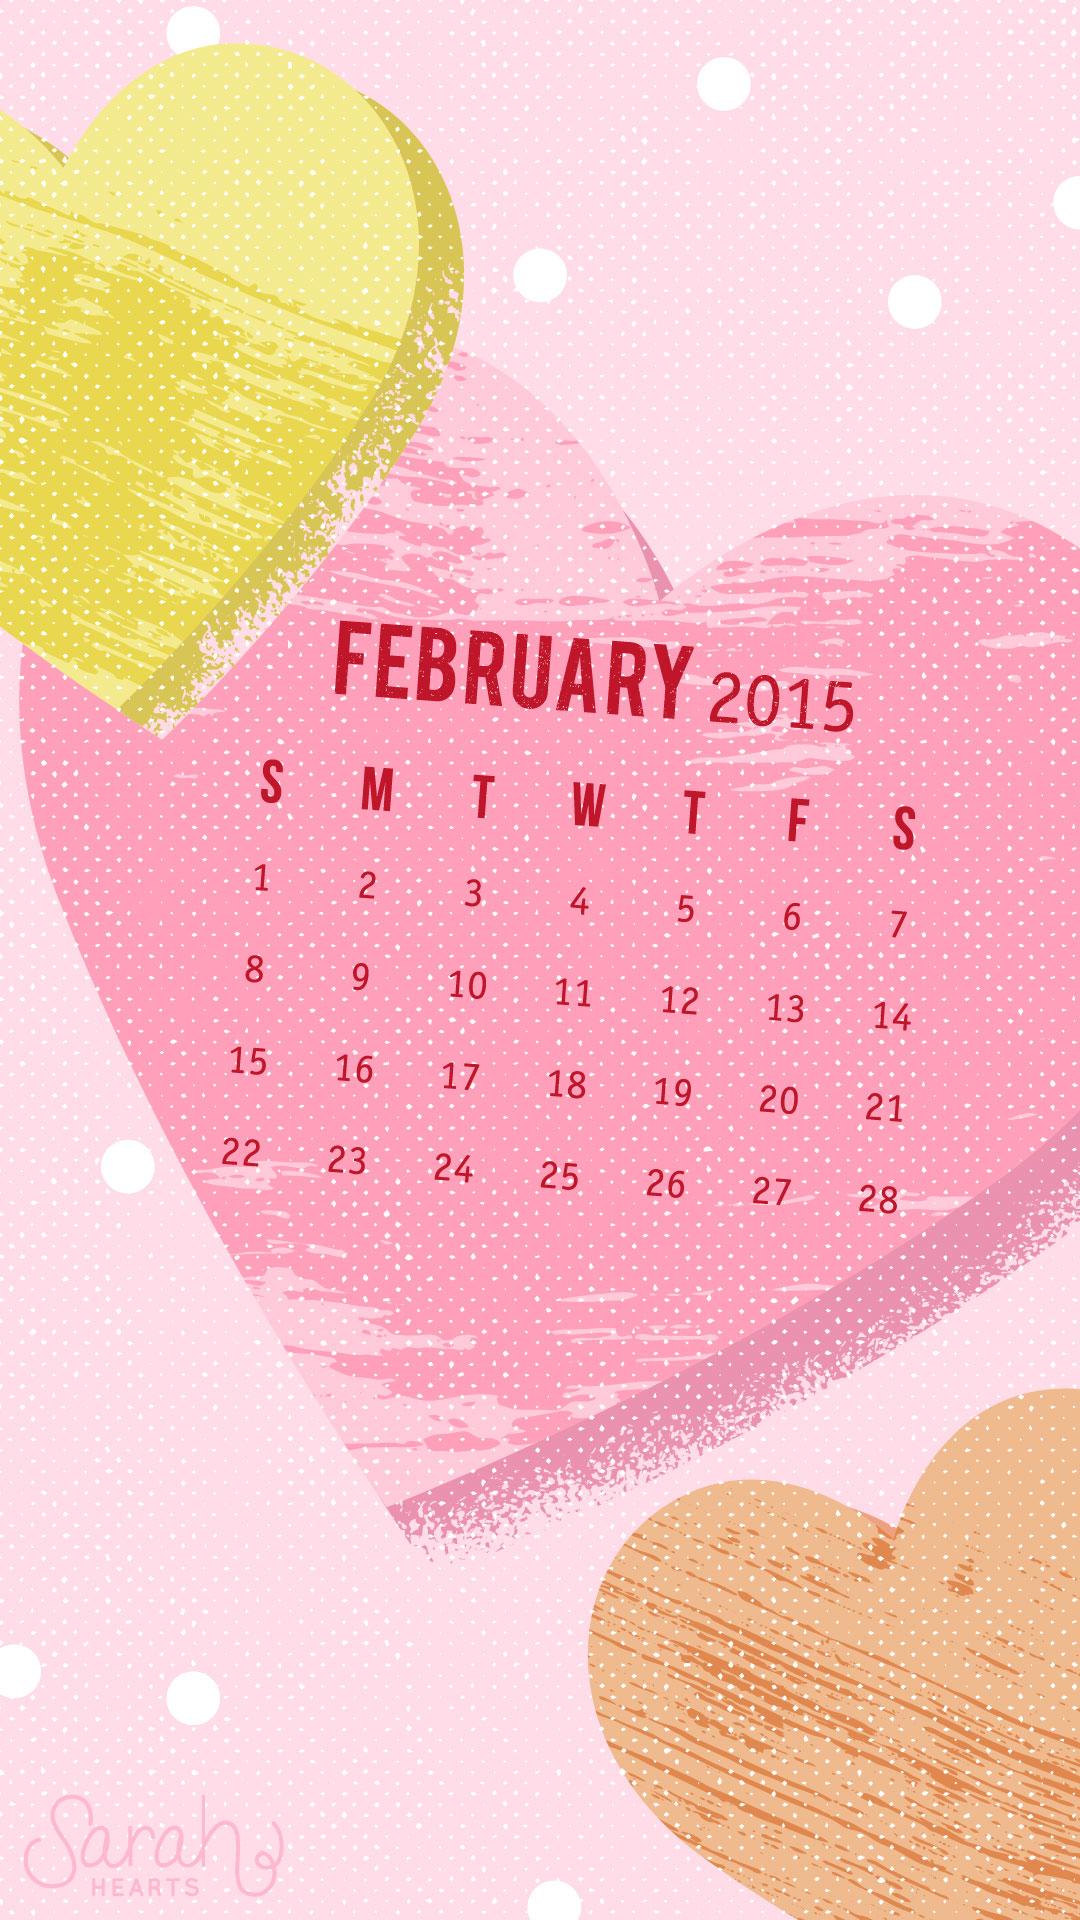 February 2015 Calendar Wallpaper   Sarah Hearts 1080x1920